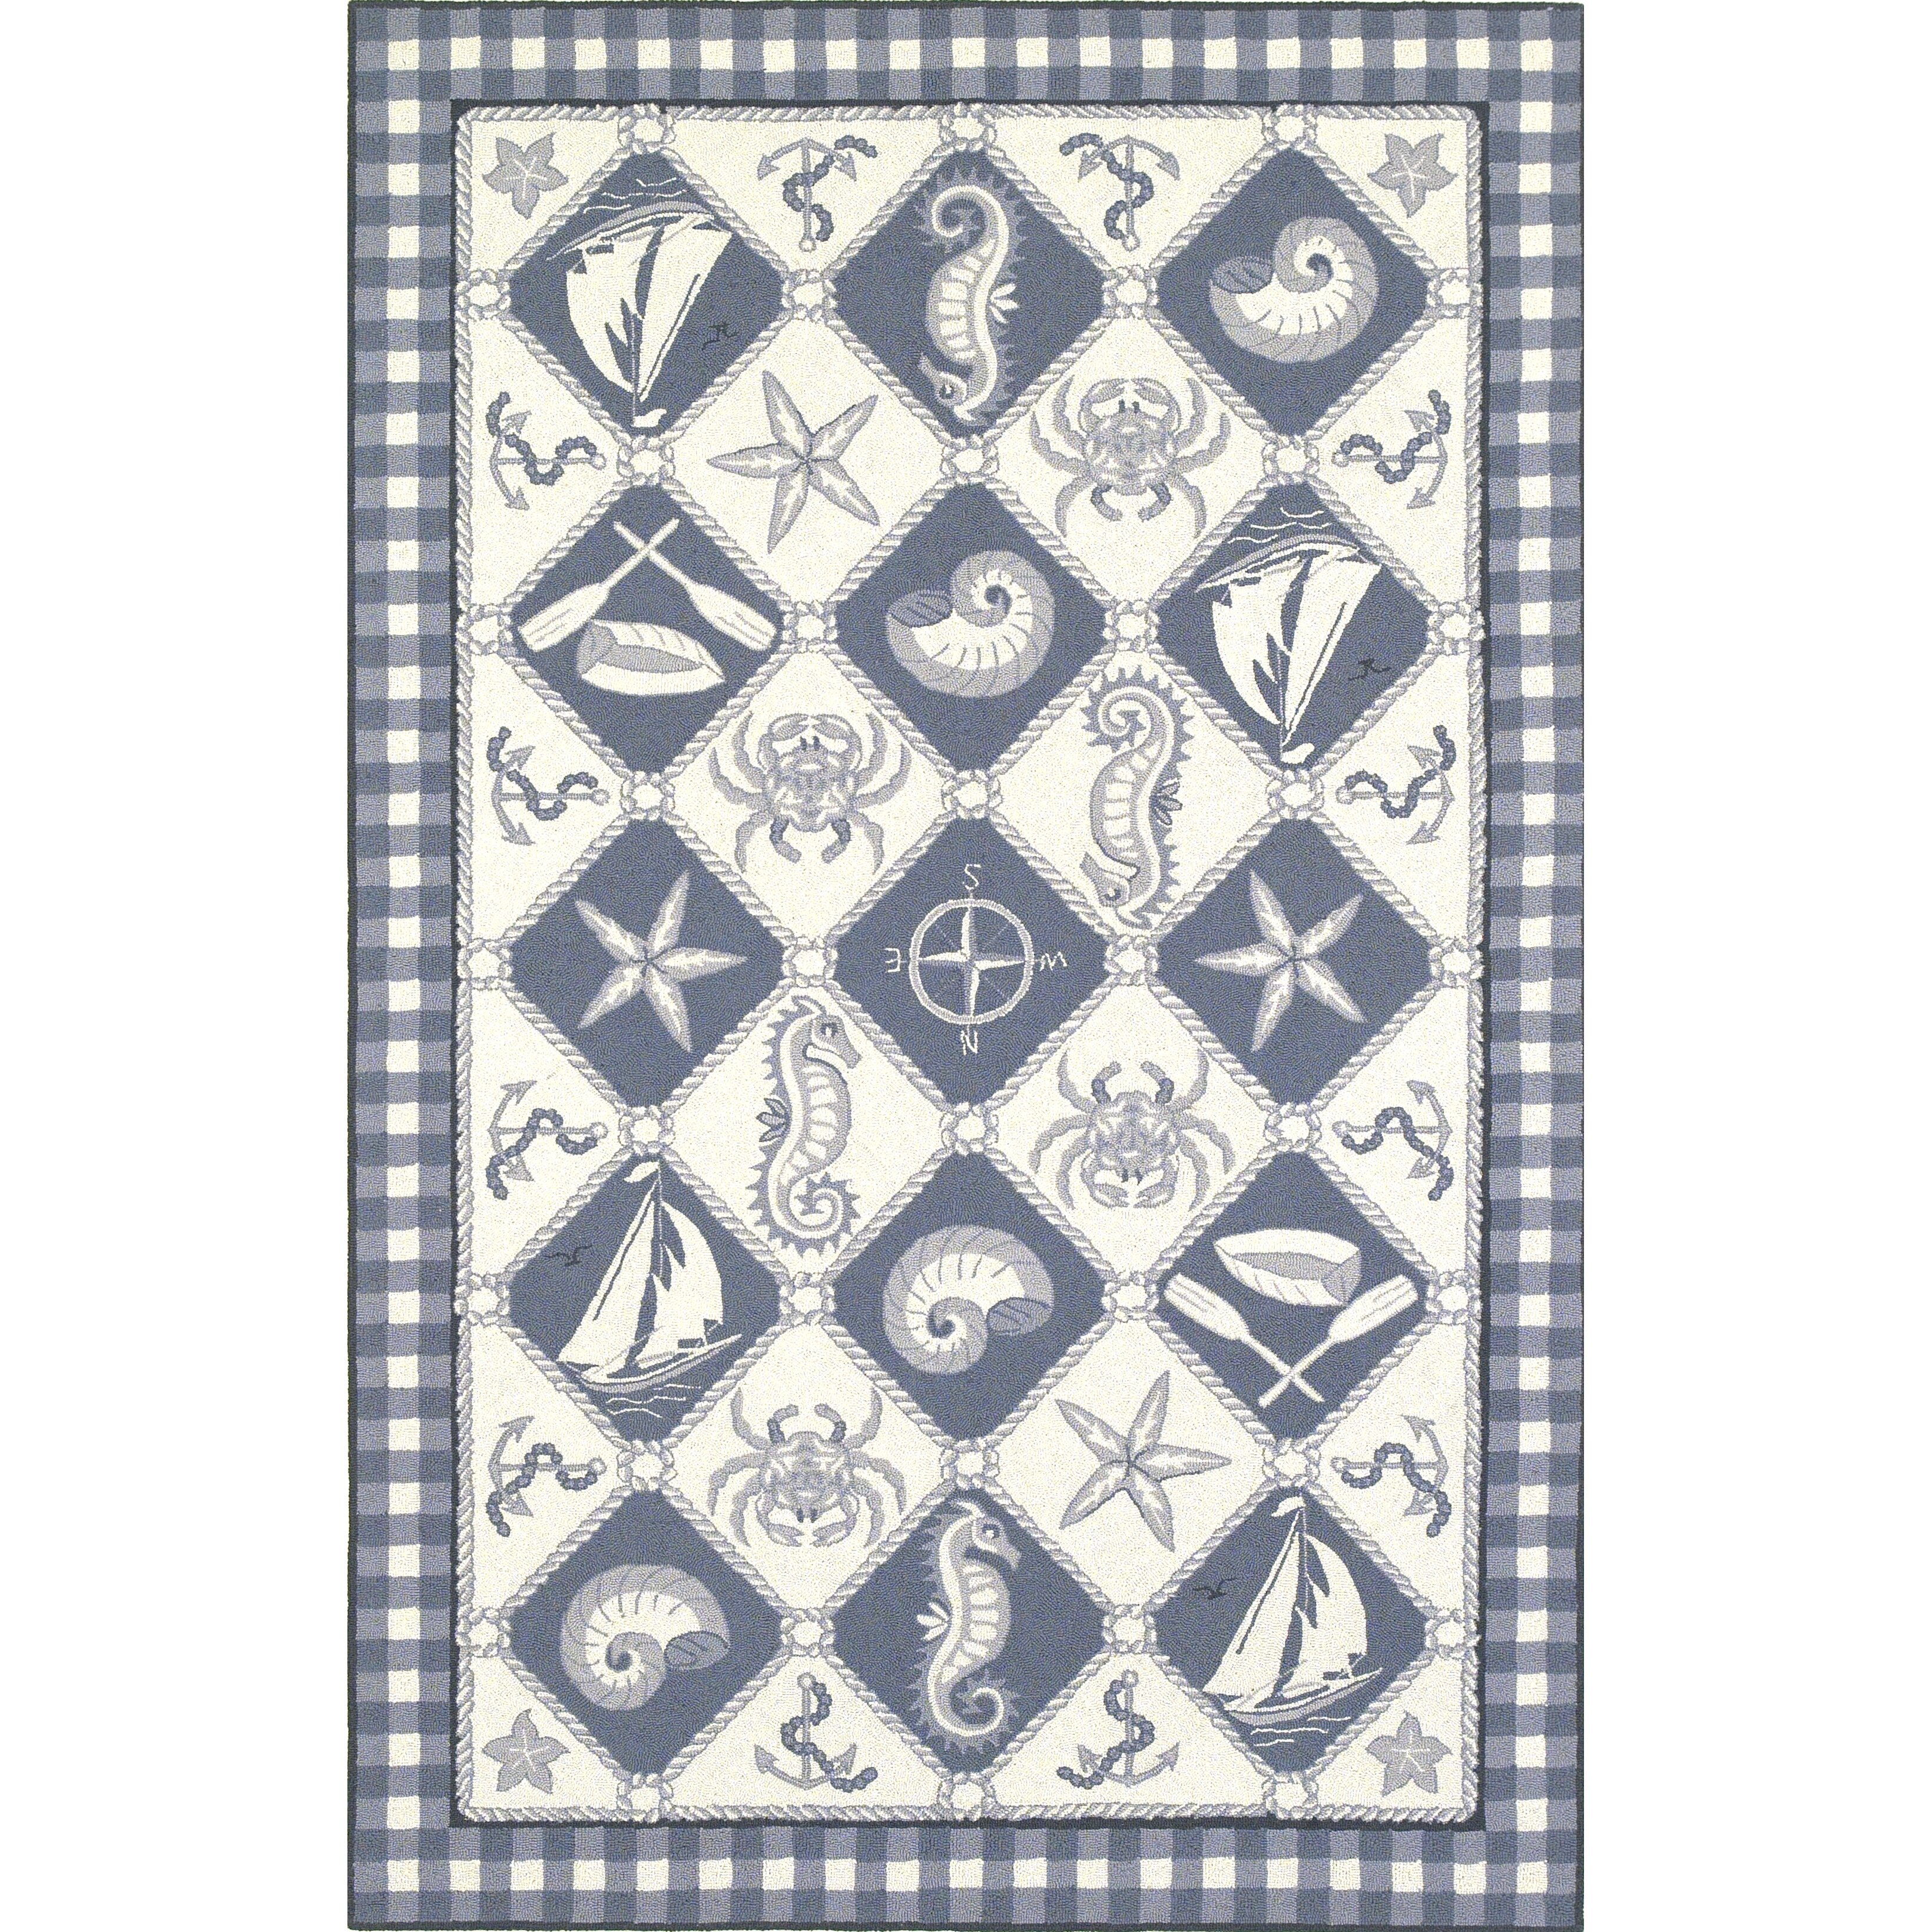 Nautical Blue Rug: KAS Rugs Colonial Blue/Ivory Nautical Novelty Rug